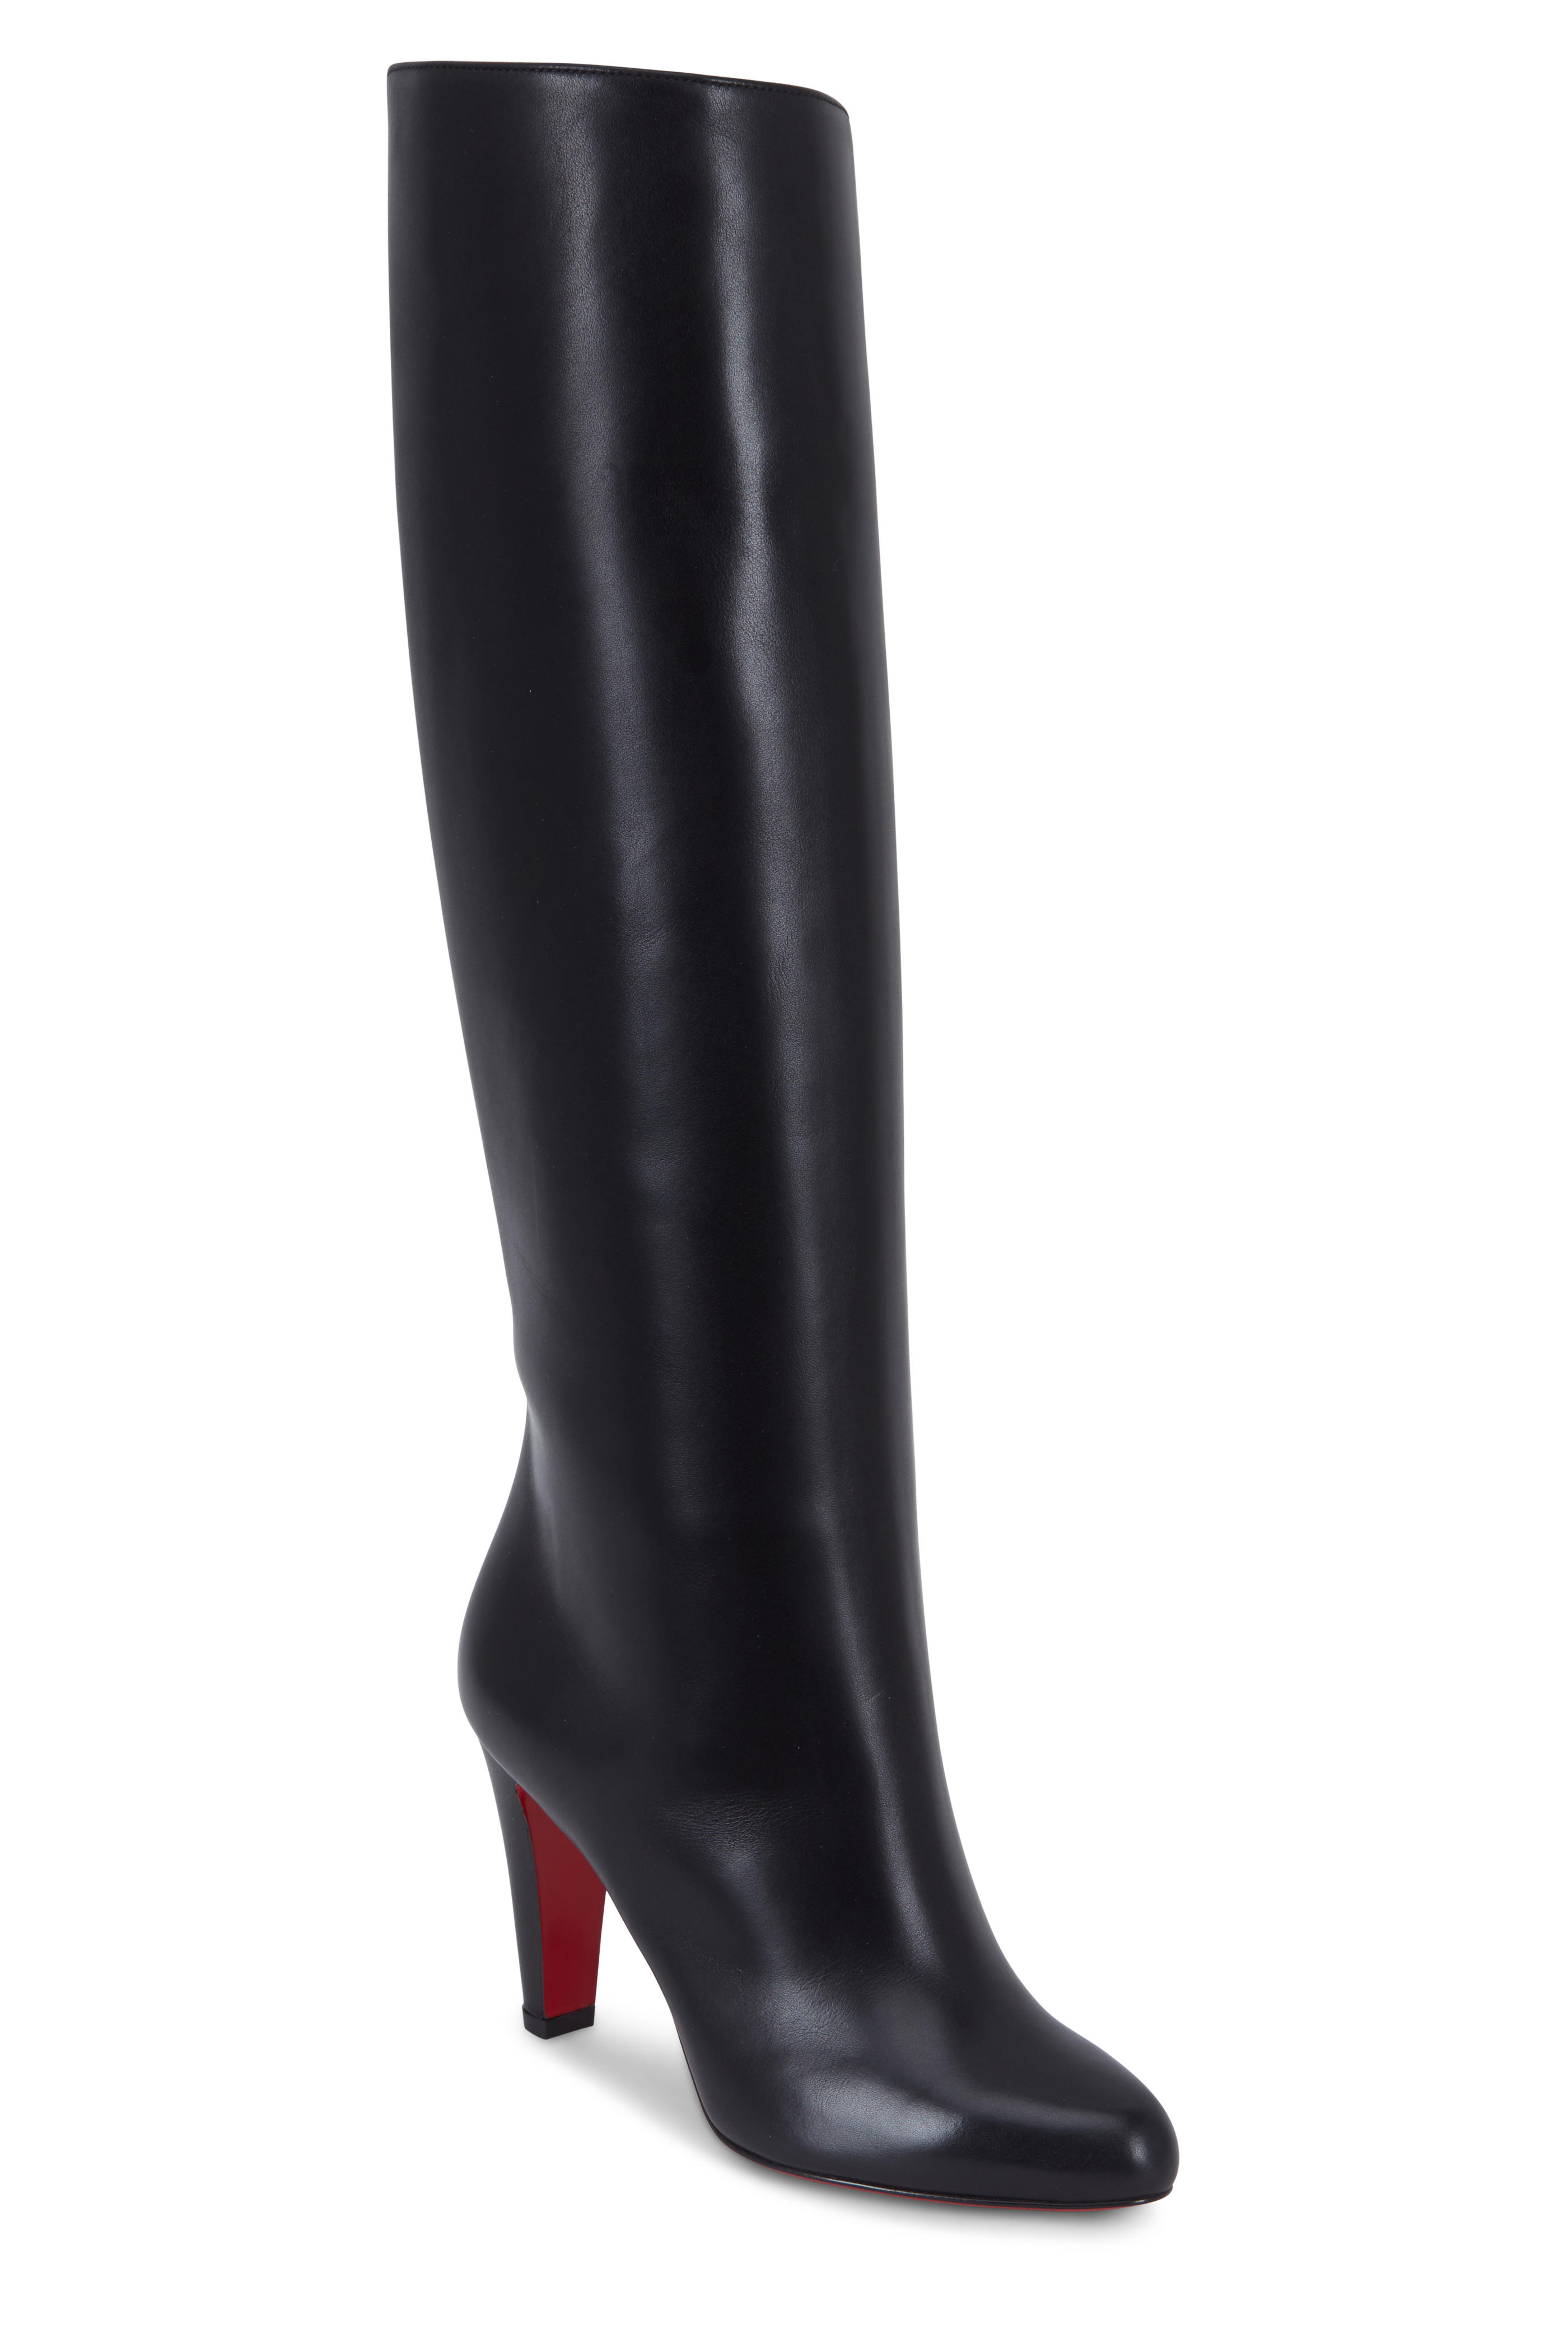 huge selection of 506d2 02d25 Christian Louboutin - Marmara Black Leather Tall Opera Boot ...